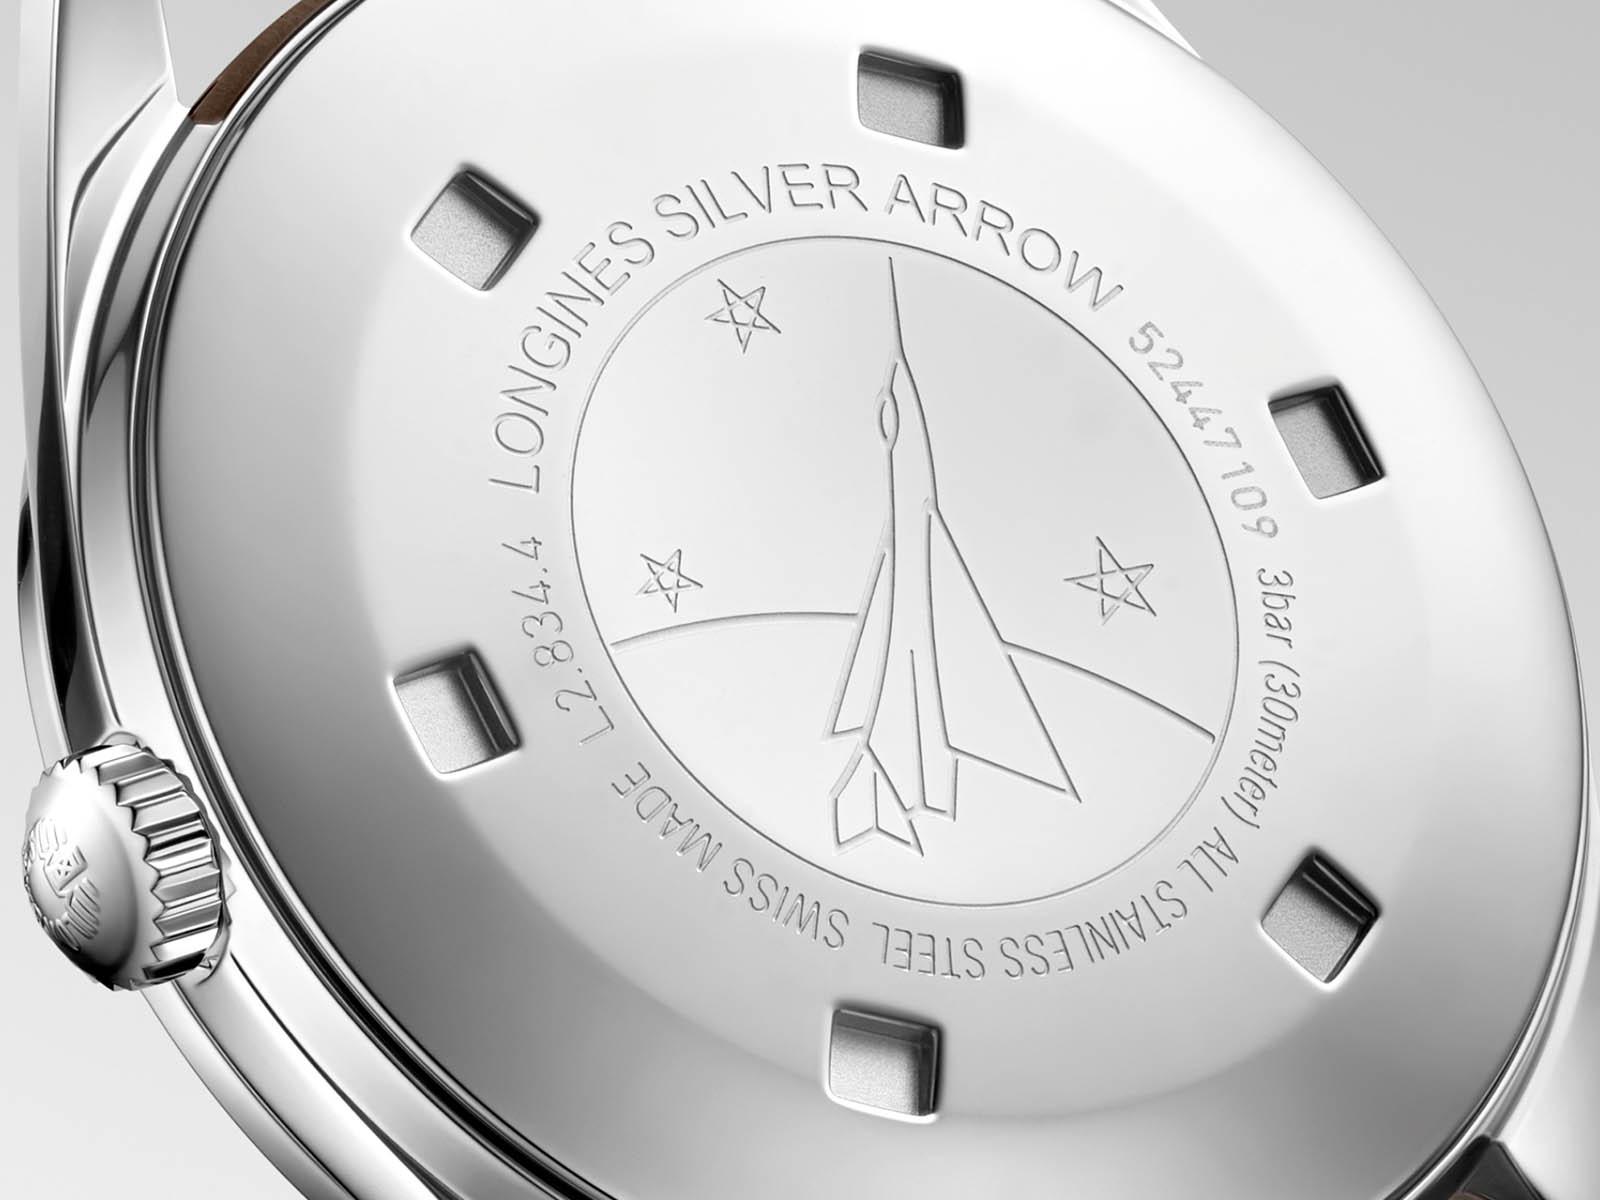 l2-834-4-72-2-longines-silver-arrow-heritage-5.jpg